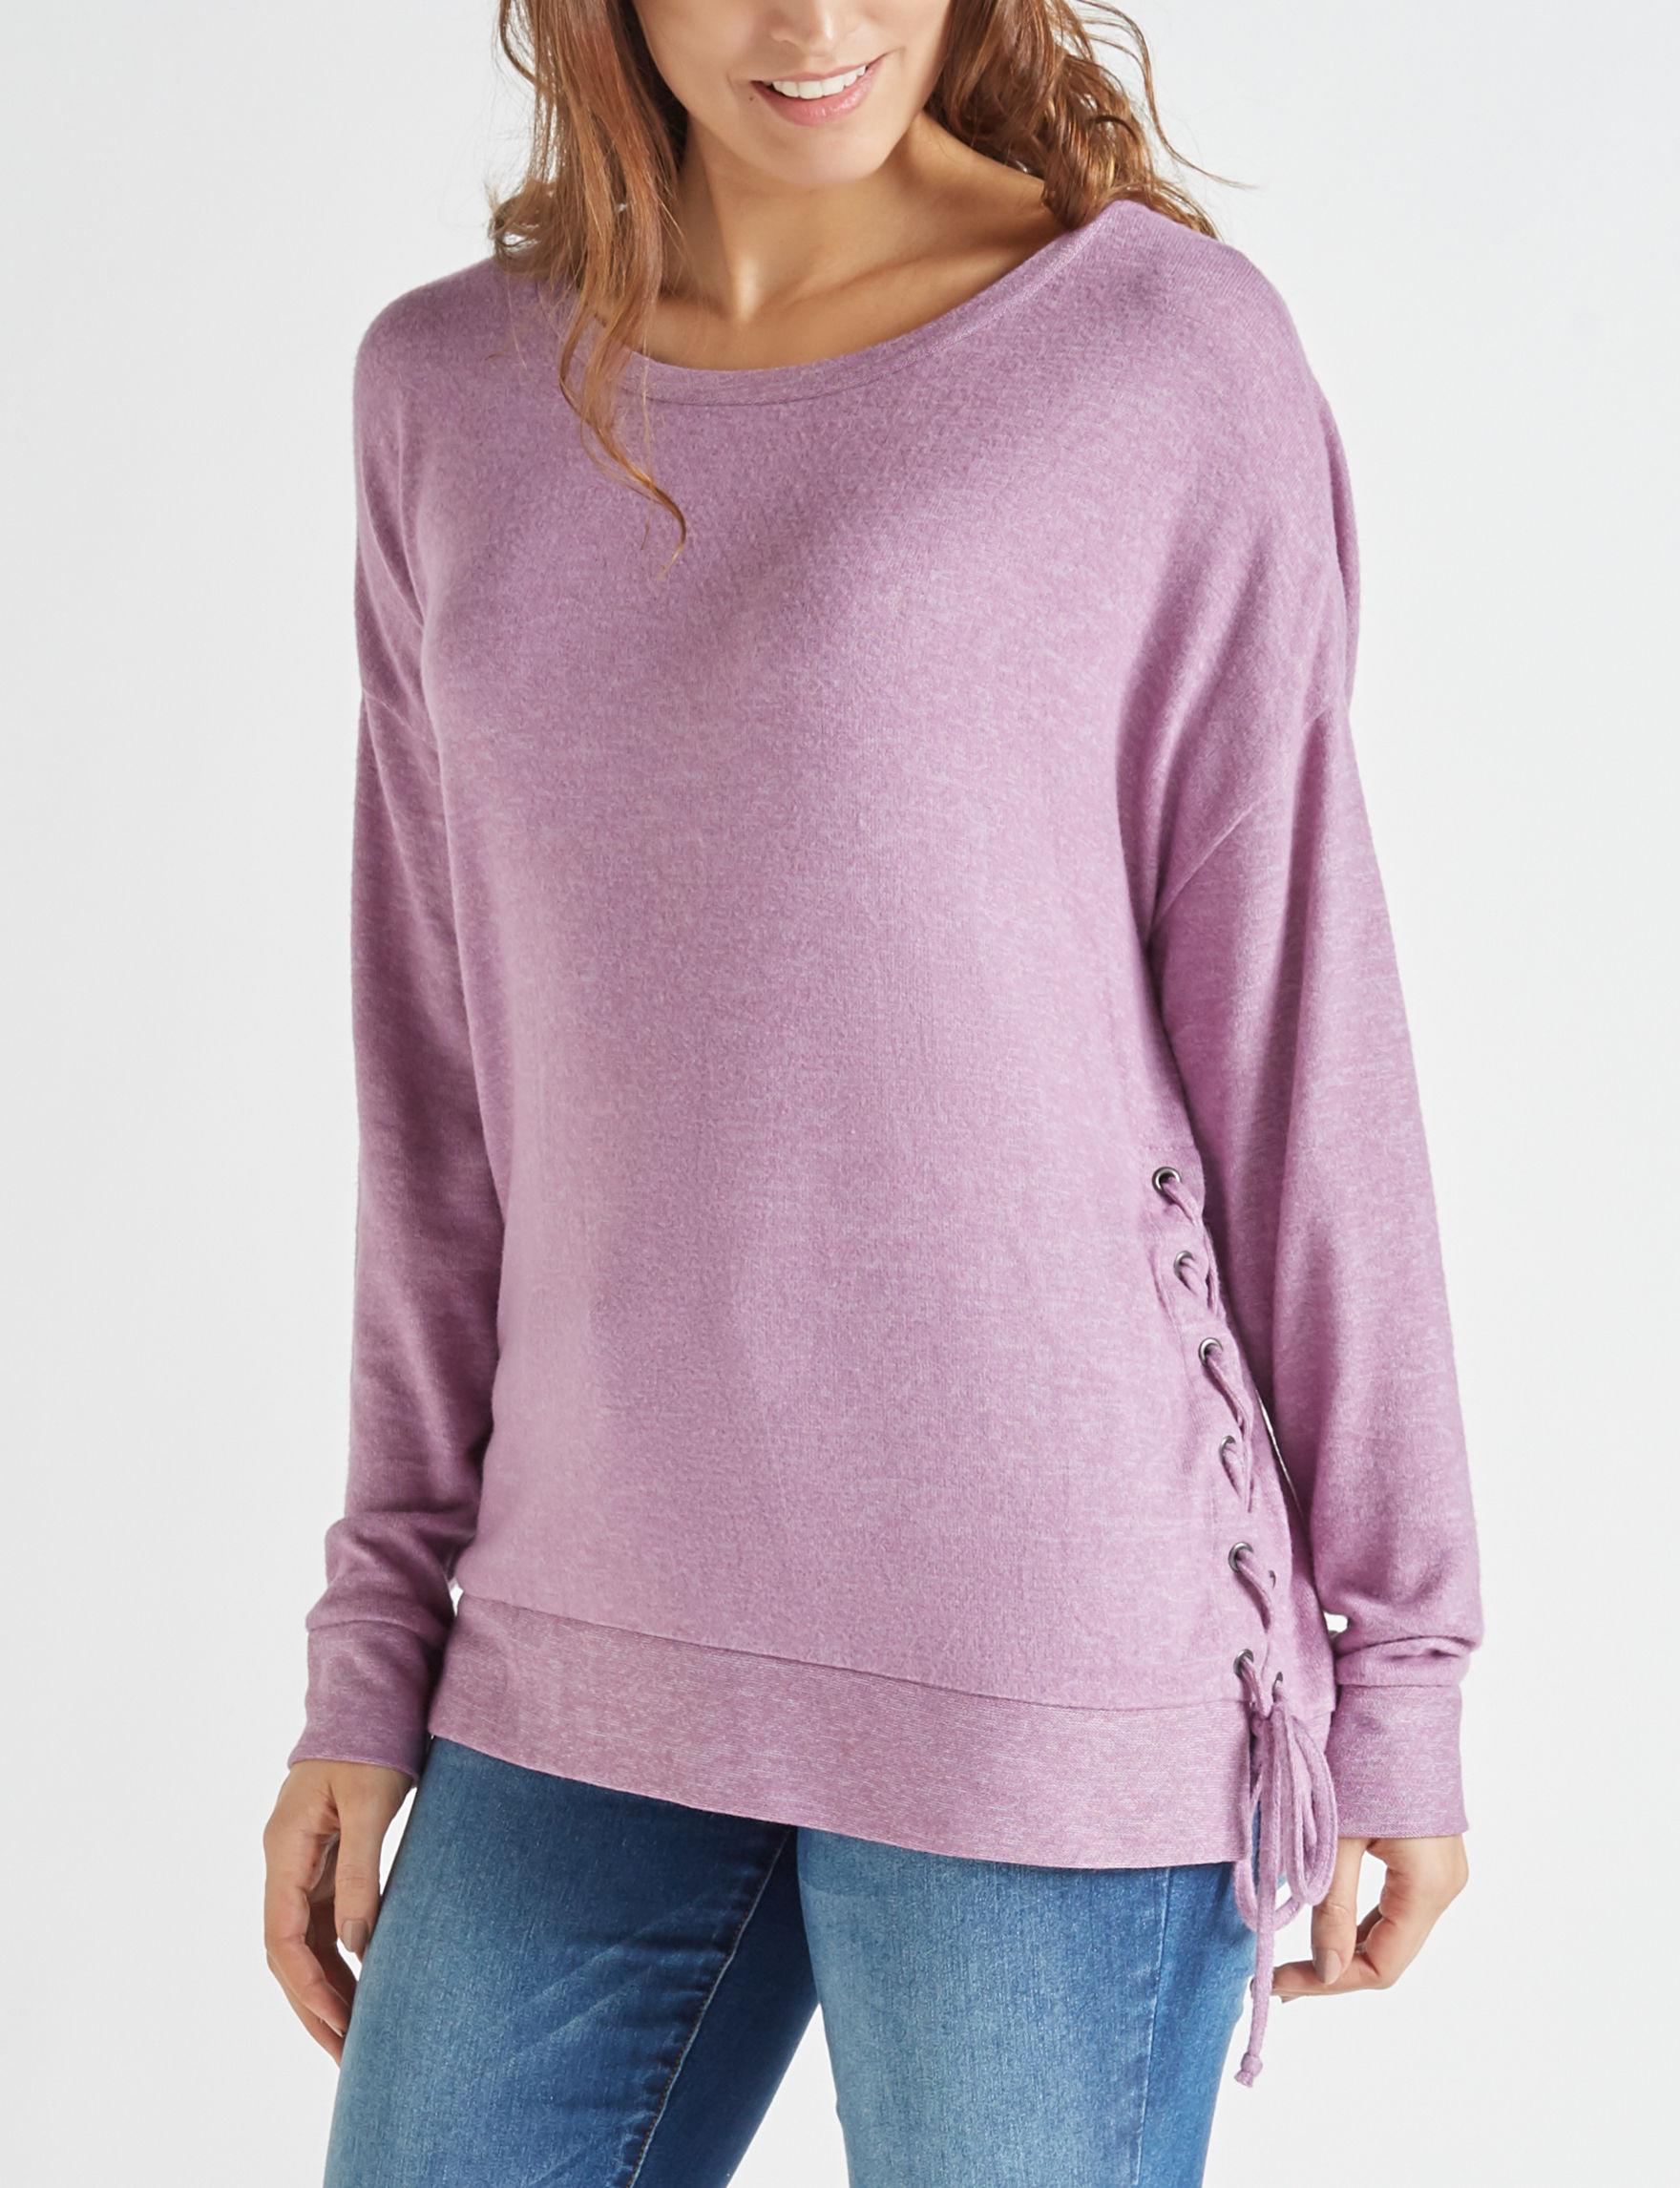 Signature Studio Lilac Shirts & Blouses